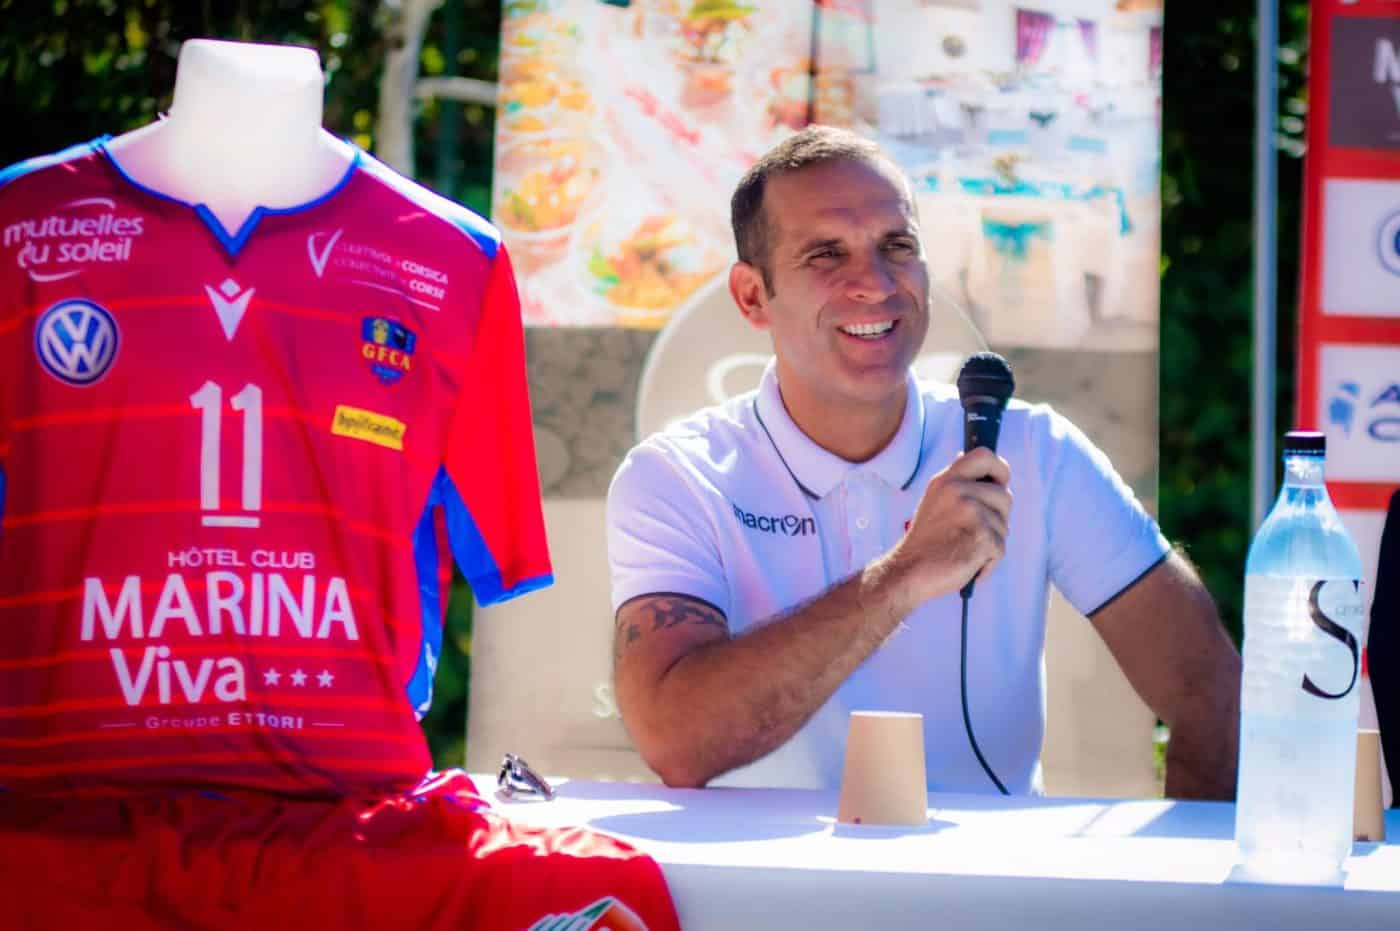 maillot-volley-LAM-2019-2020-GFCA-macron-1